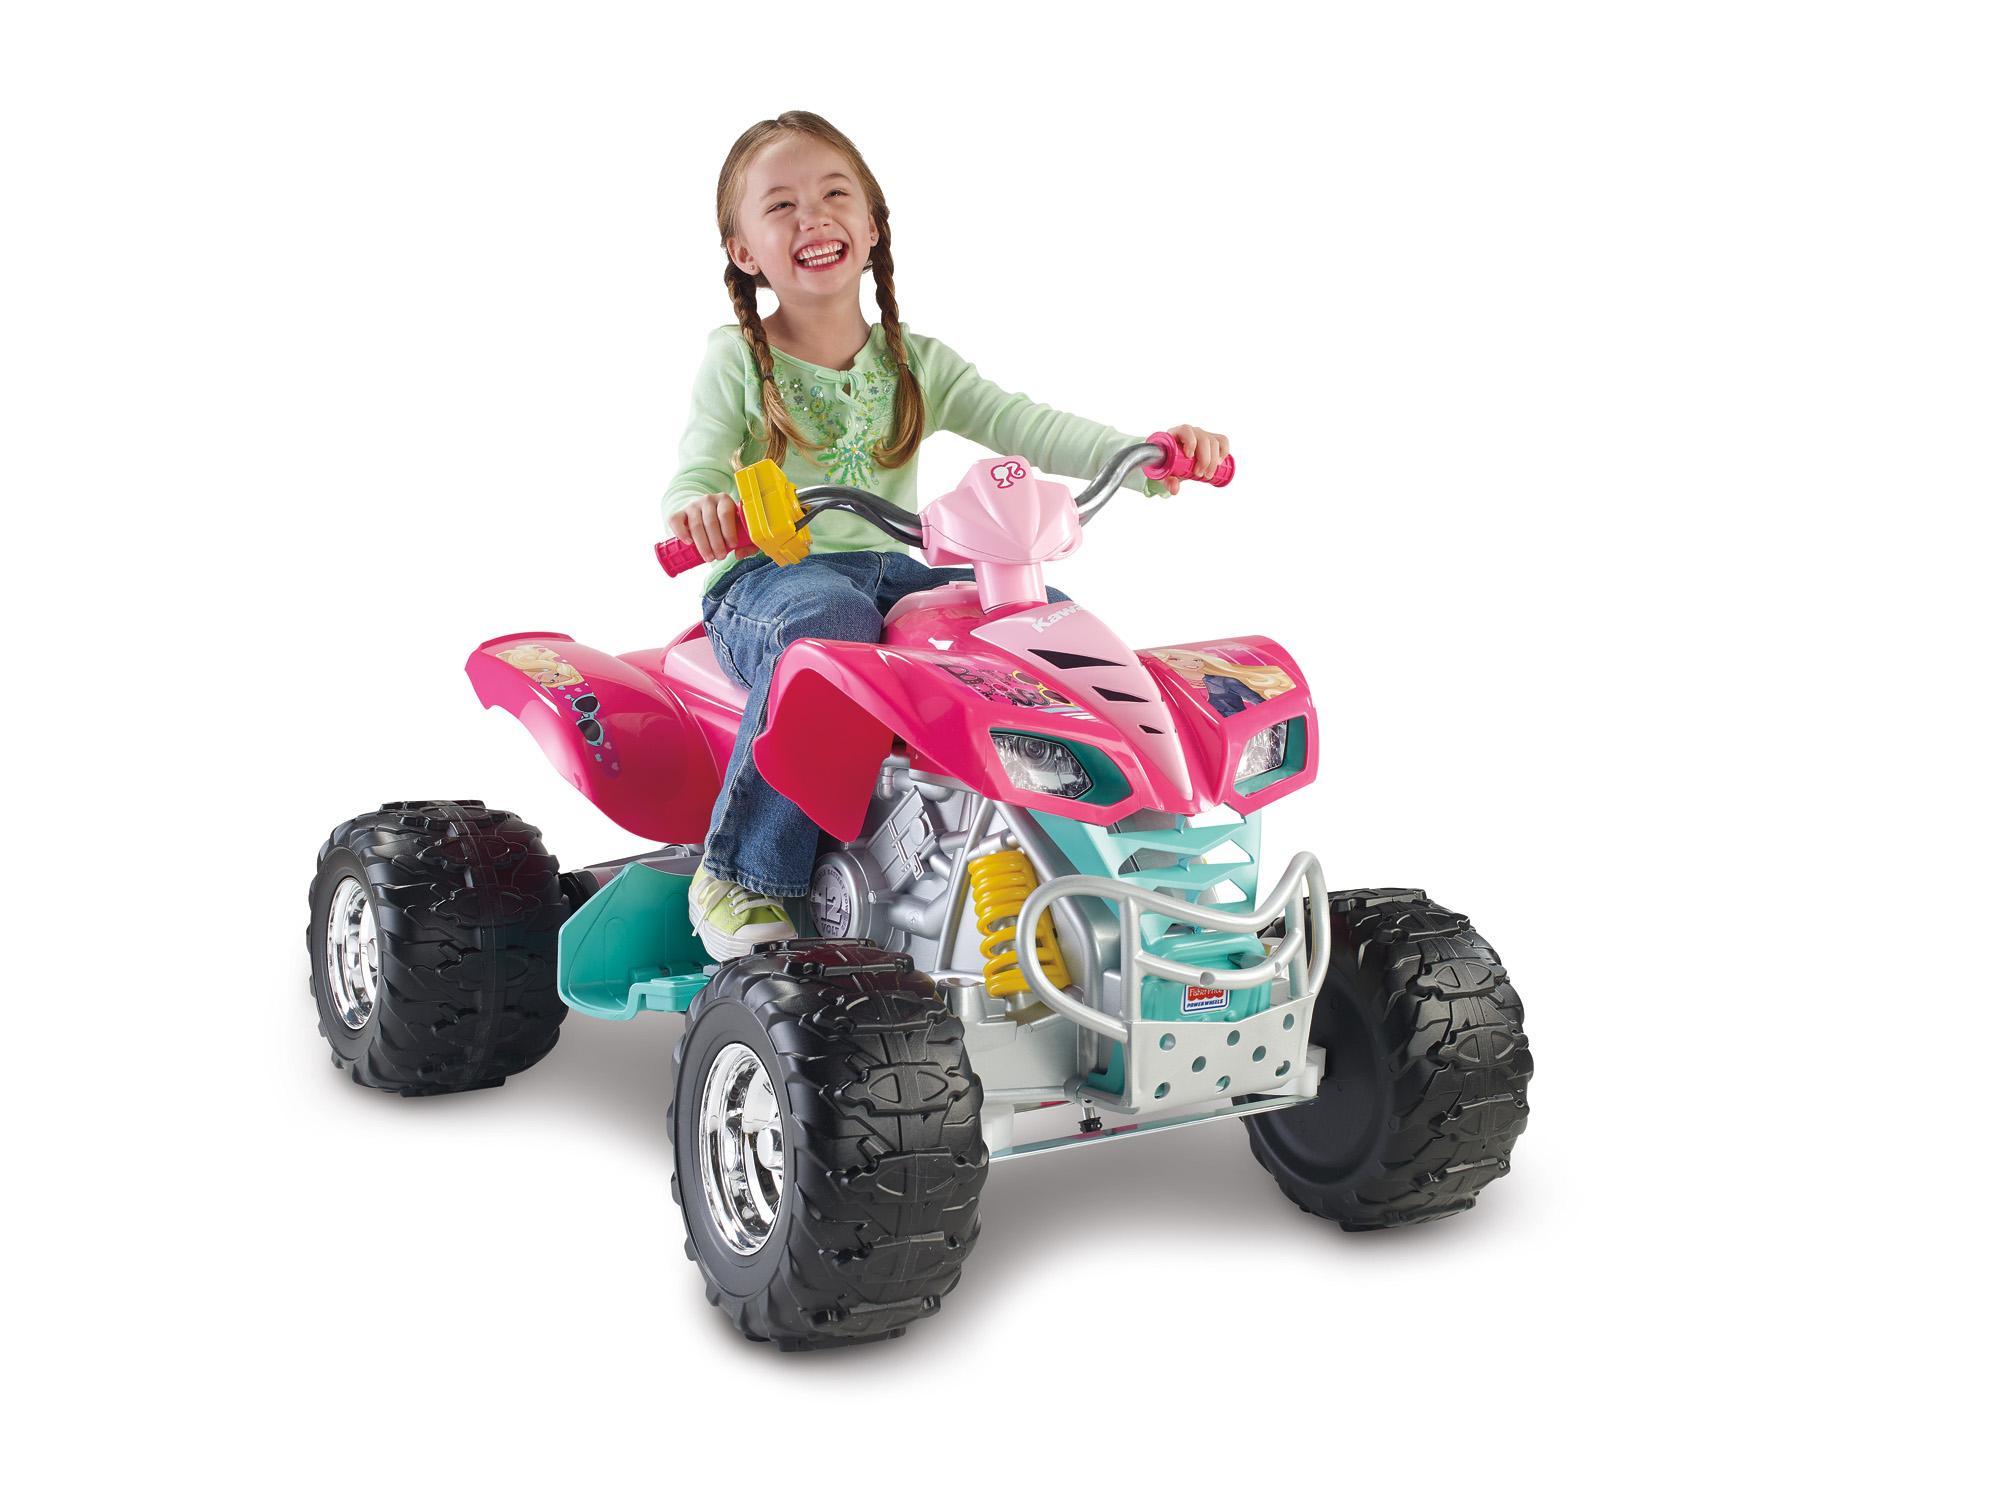 S Ride On Atv 4 Wheeler Barbie Kawasaki Kfx Vehicle 12 Volt Battery Ed